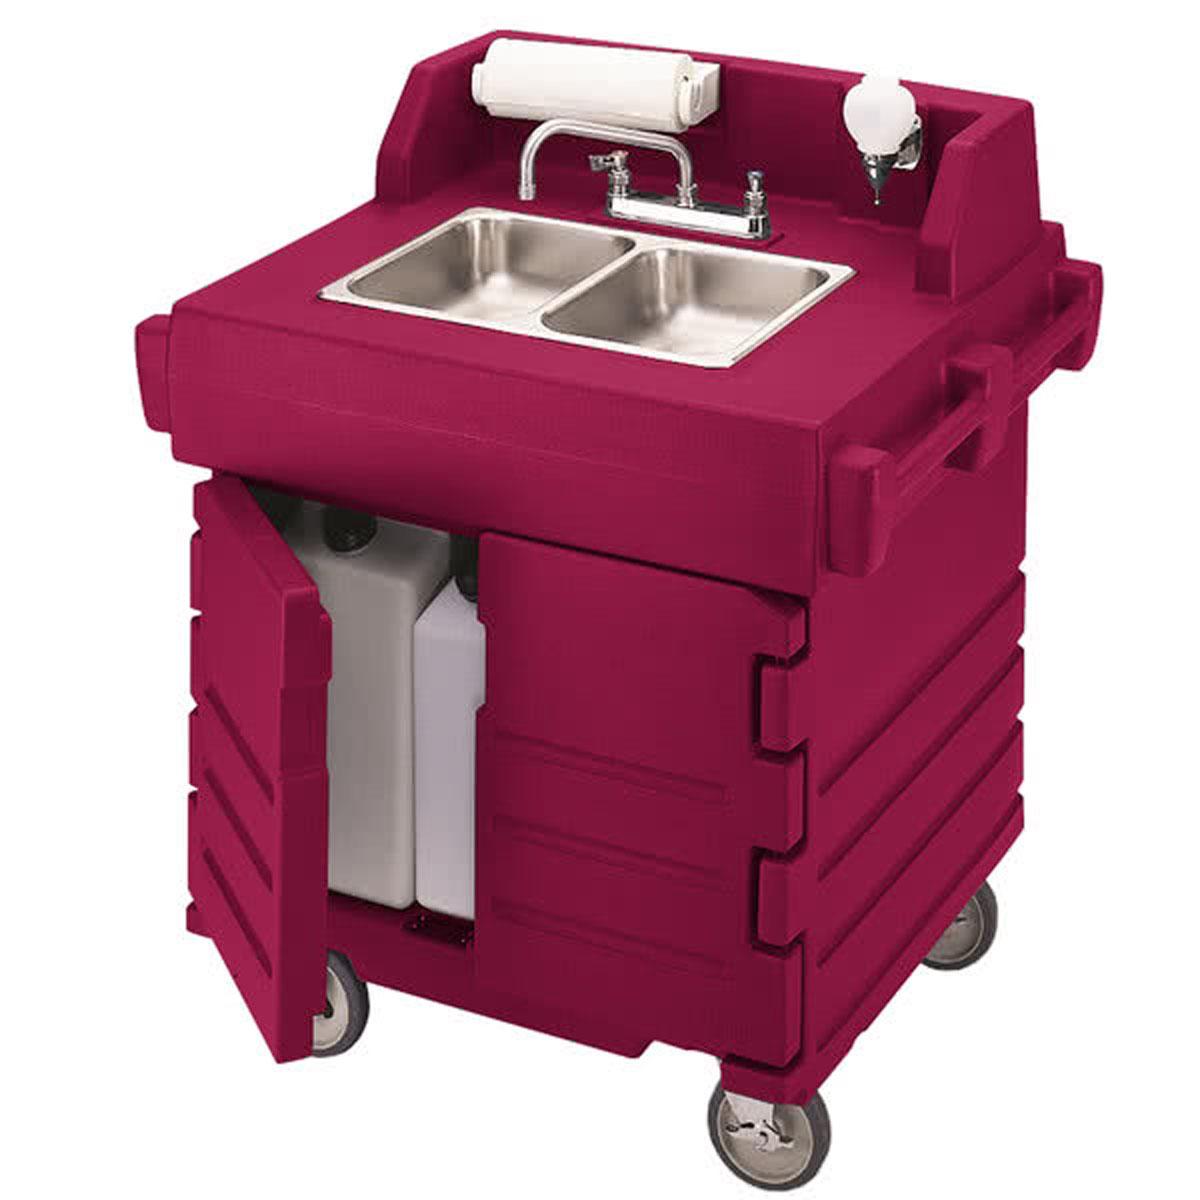 Cambro Ksc402158 Camkiosk Hand Sink Cart Hot Red Food